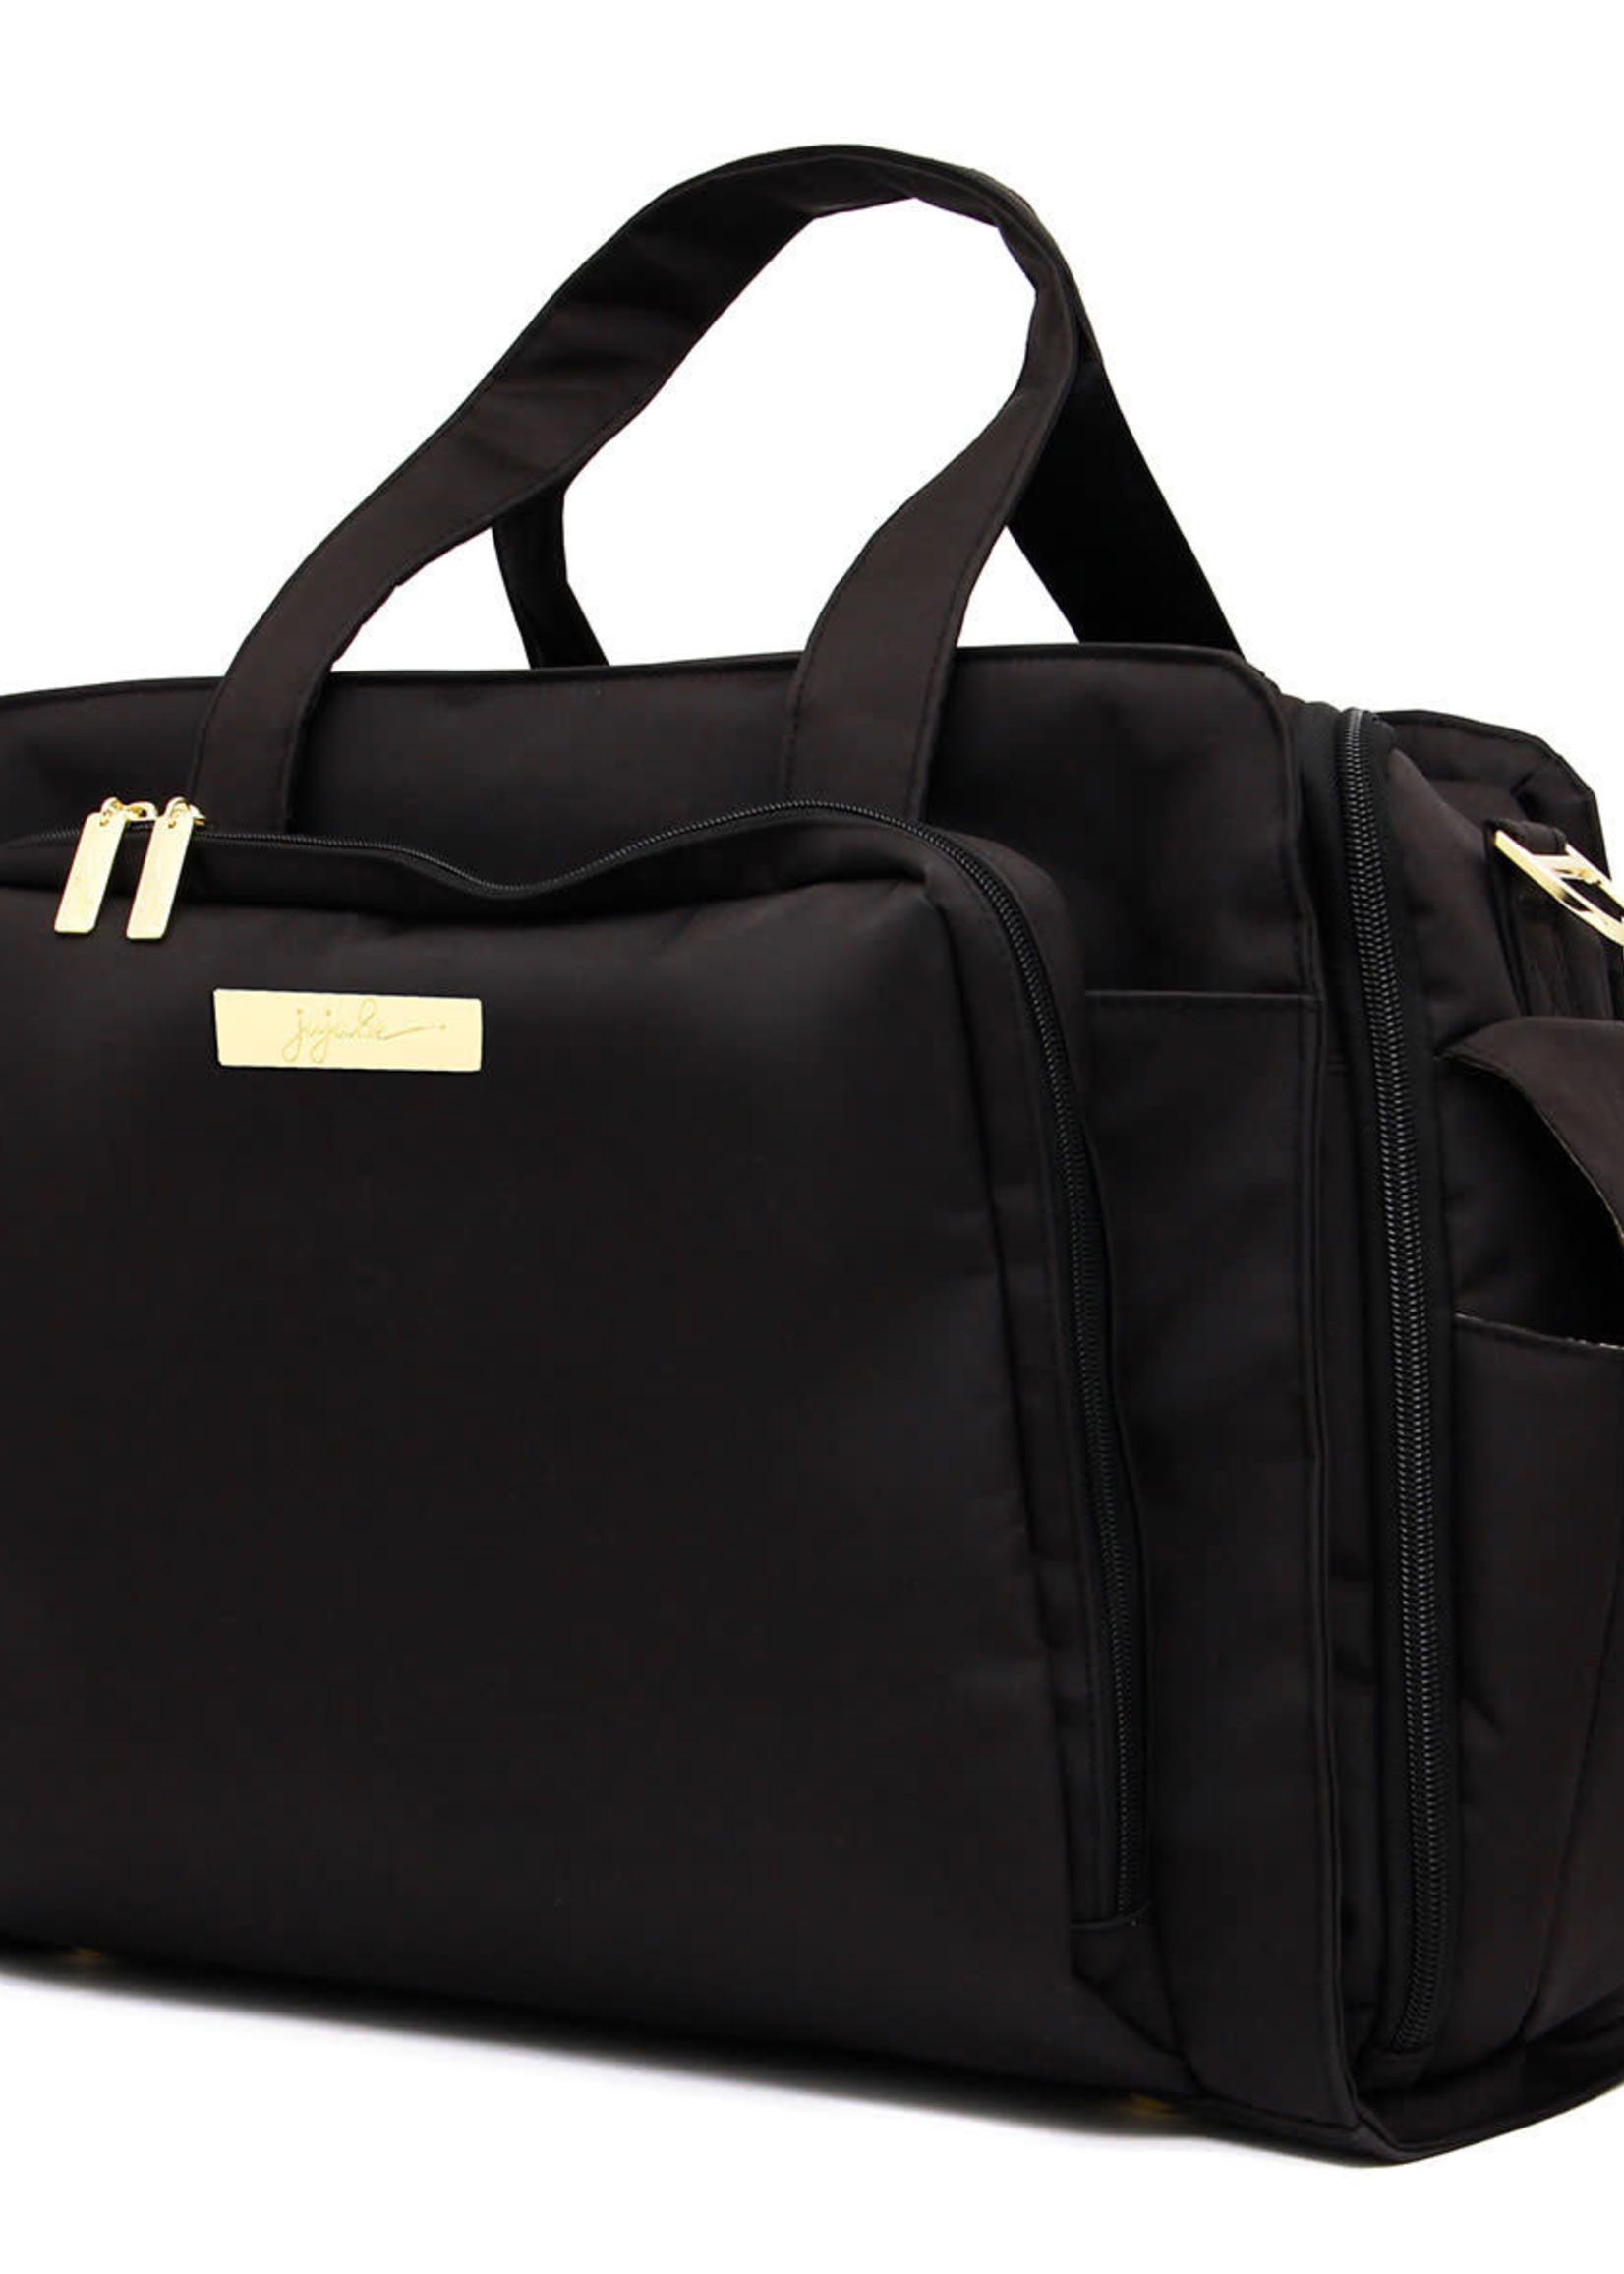 Jujube Jujube Be Prepared Diaper Bag (Monarch)